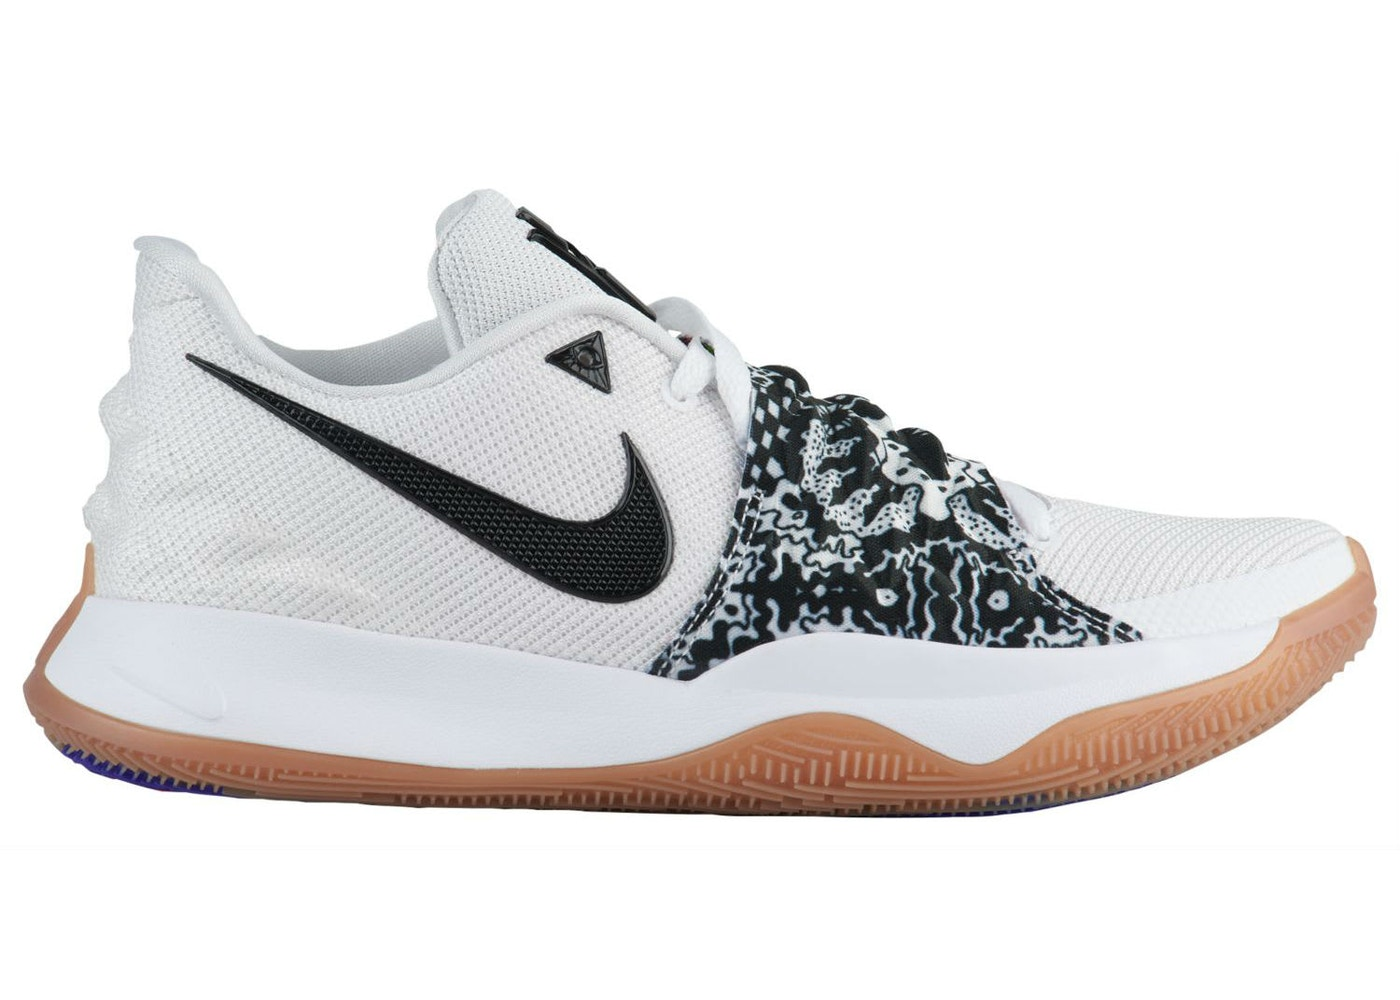 Nike Kyrie 4 Low White Black